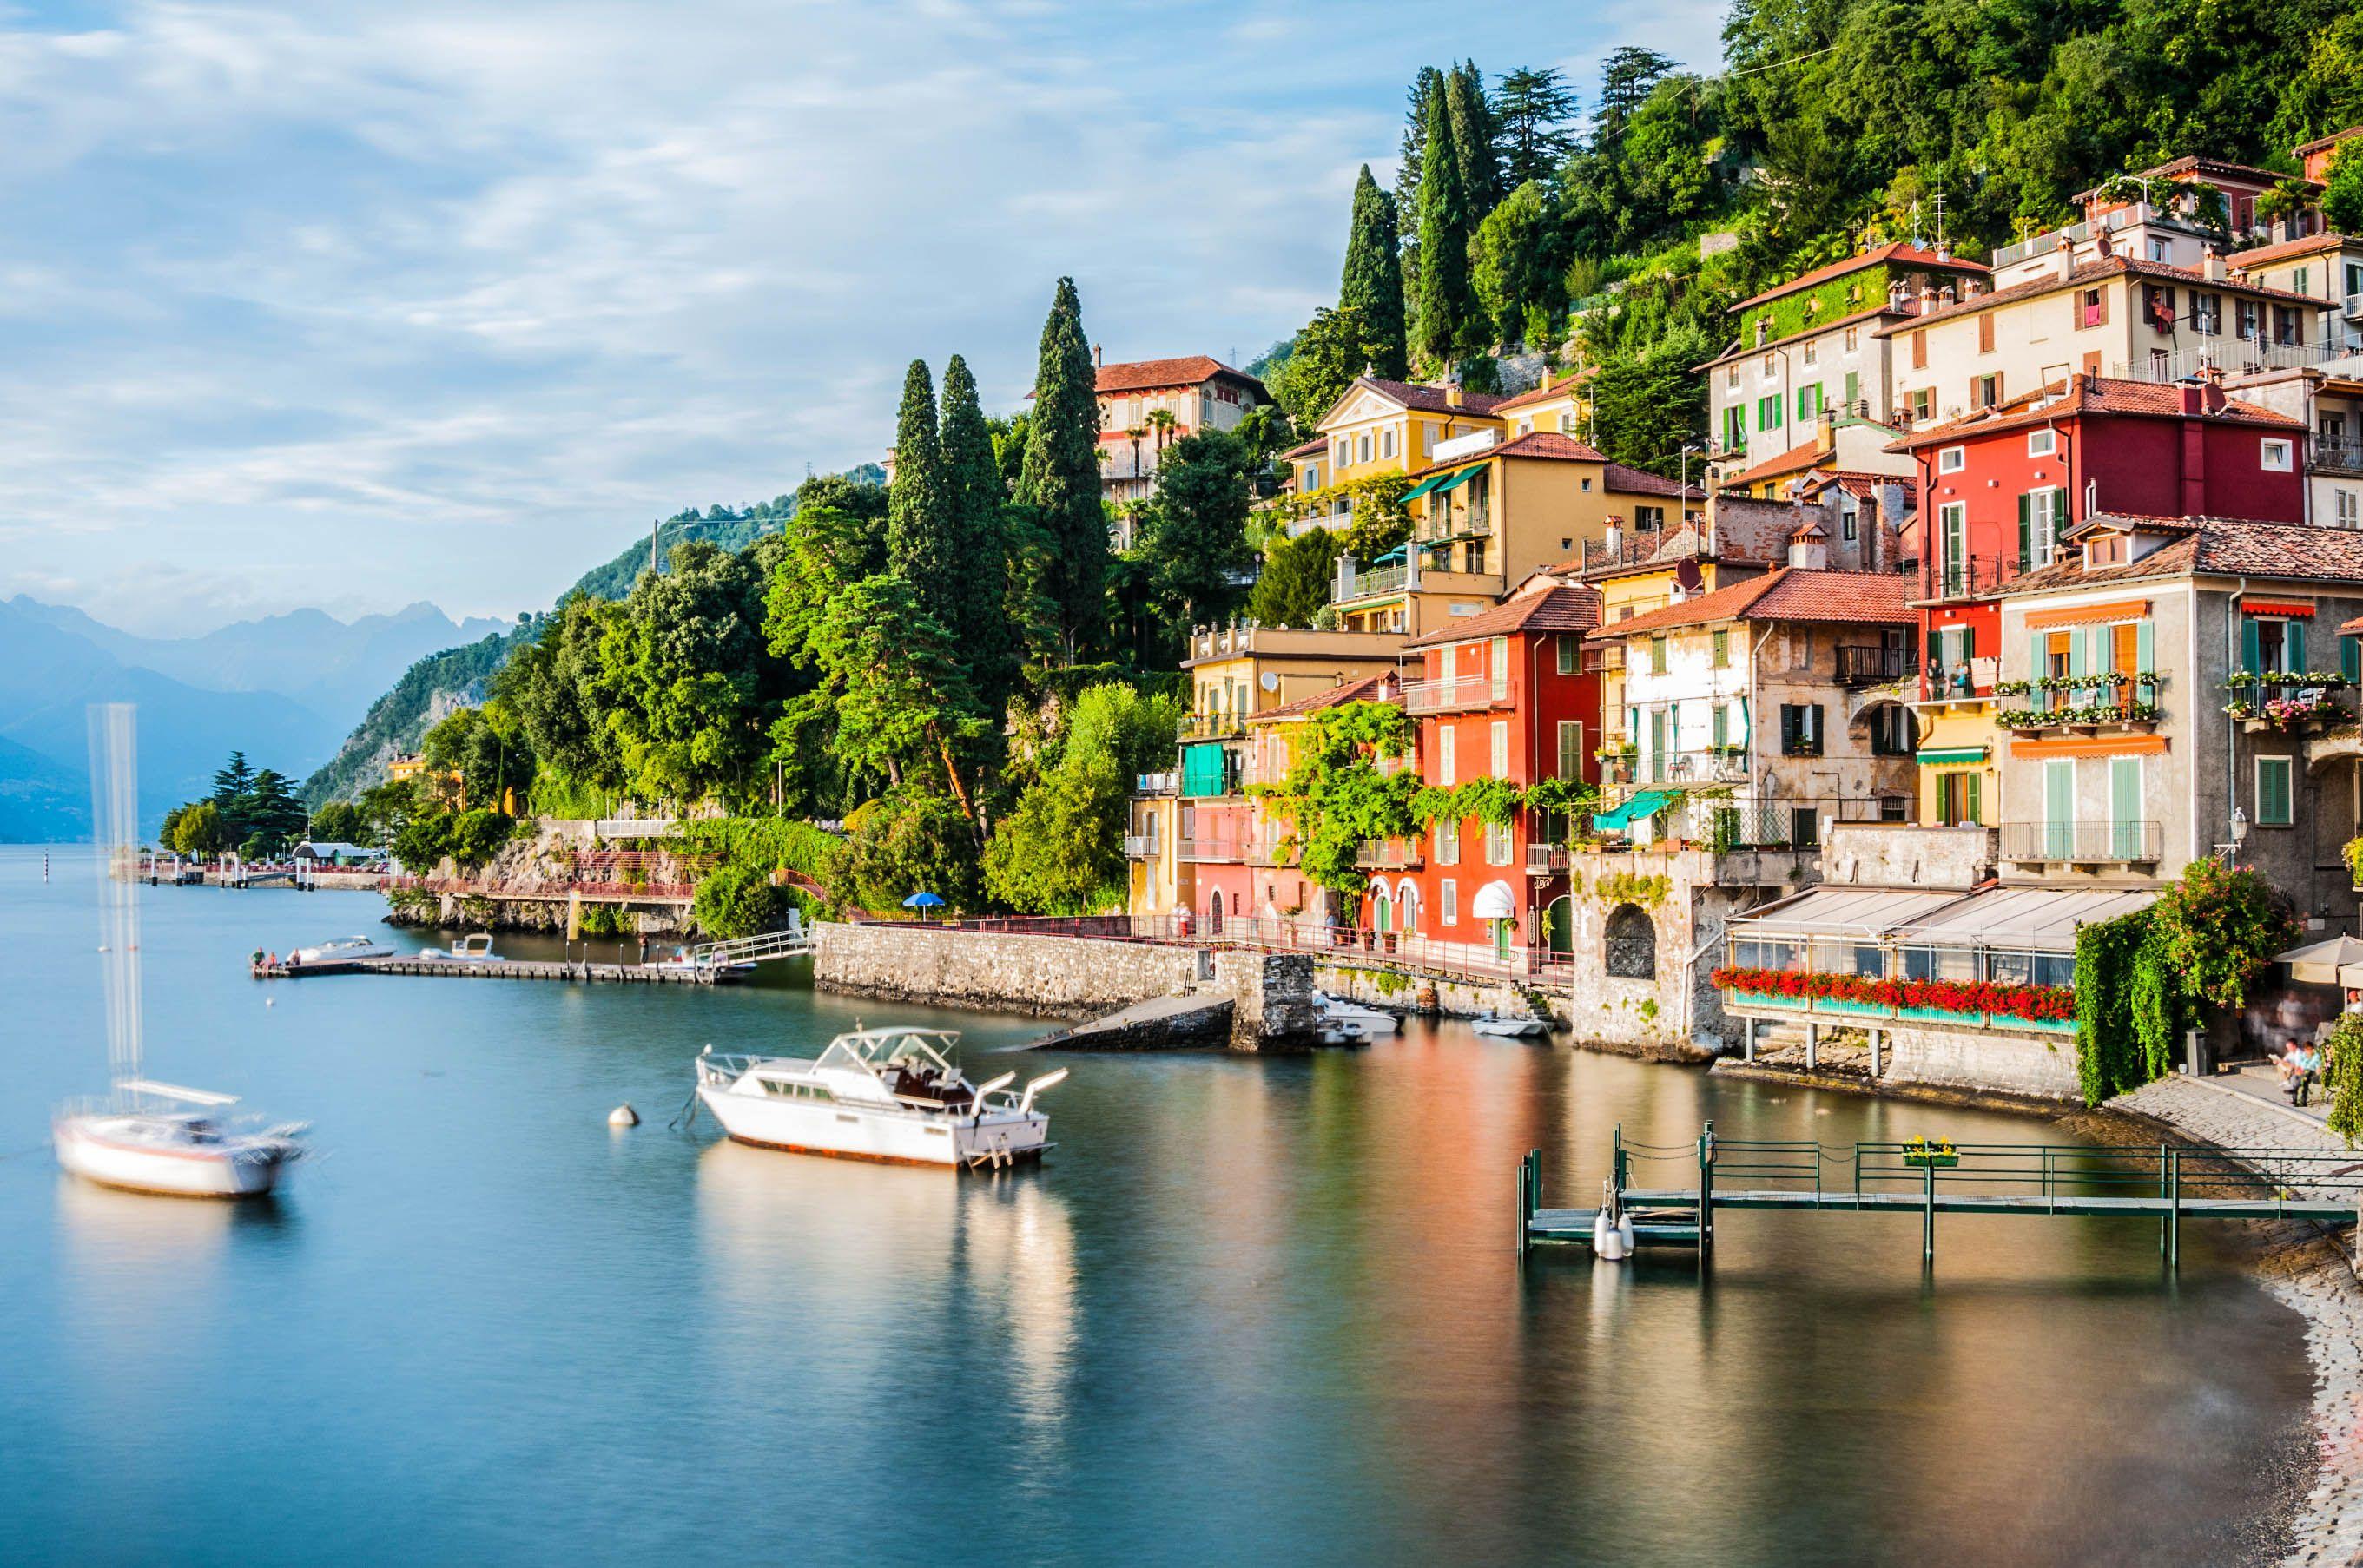 Lake Como. Lombardy, Italy.   Italy   Pinterest   Lake como, Lake ...